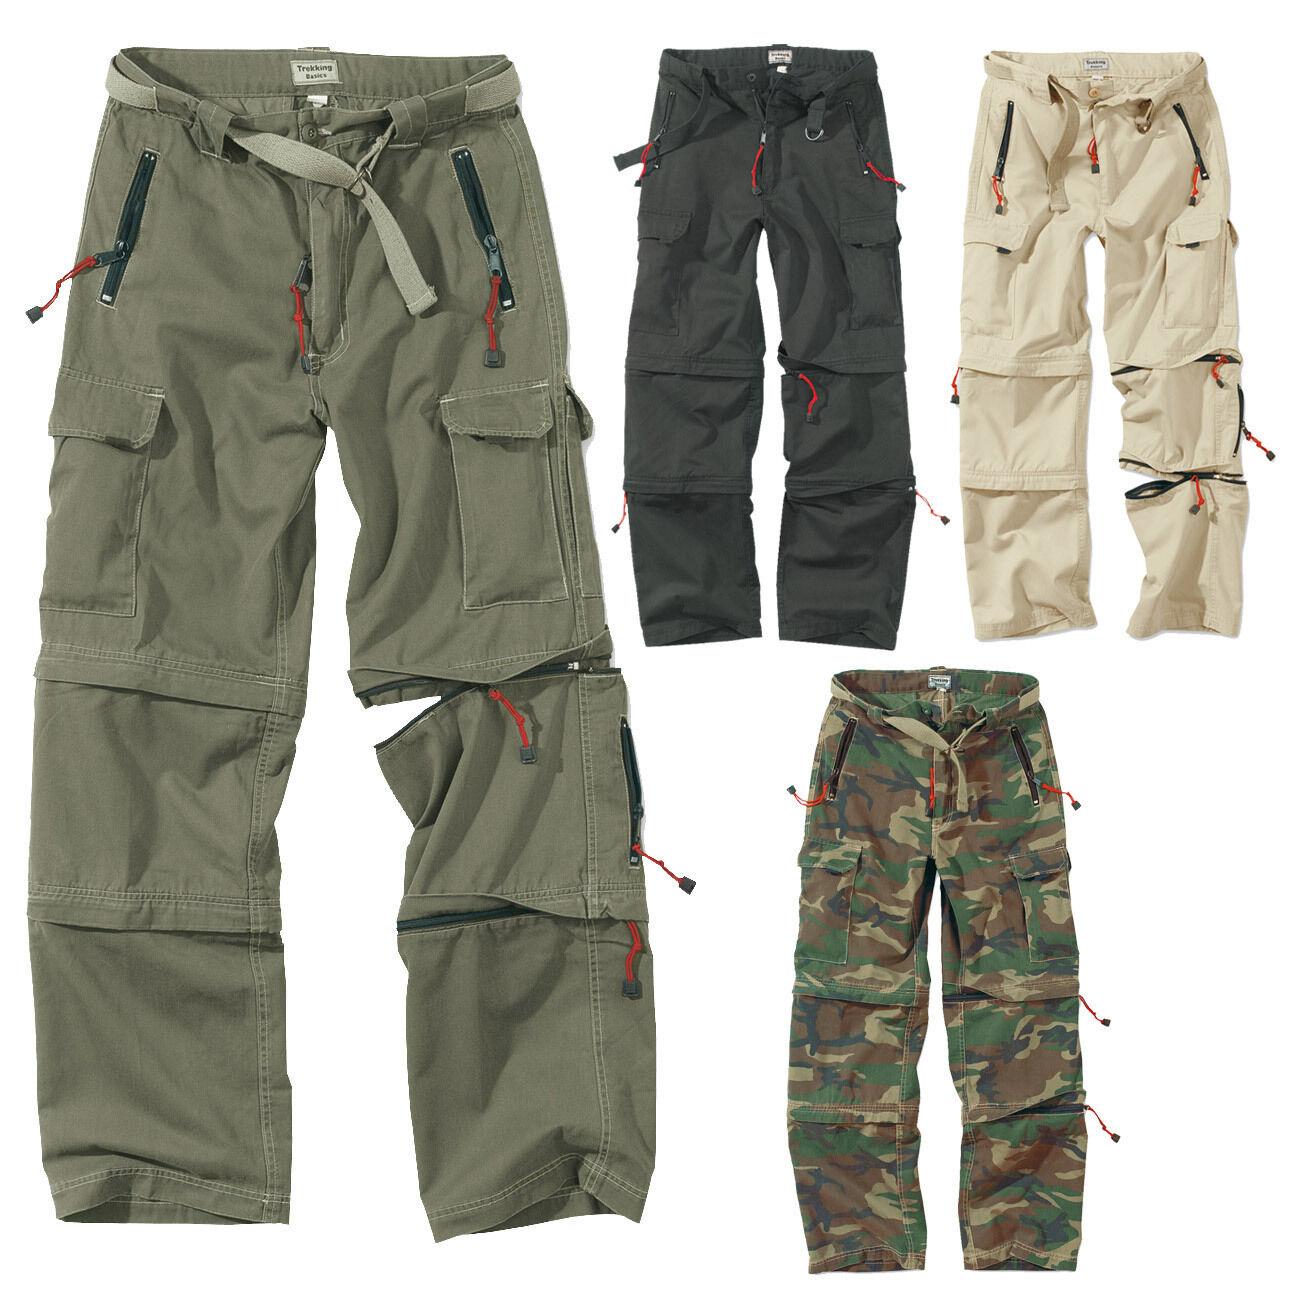 Brandit Savannah Da Uomo Outdoor Trekking Pantaloni Men Pants-NUOVO-S M L XXL 3xl